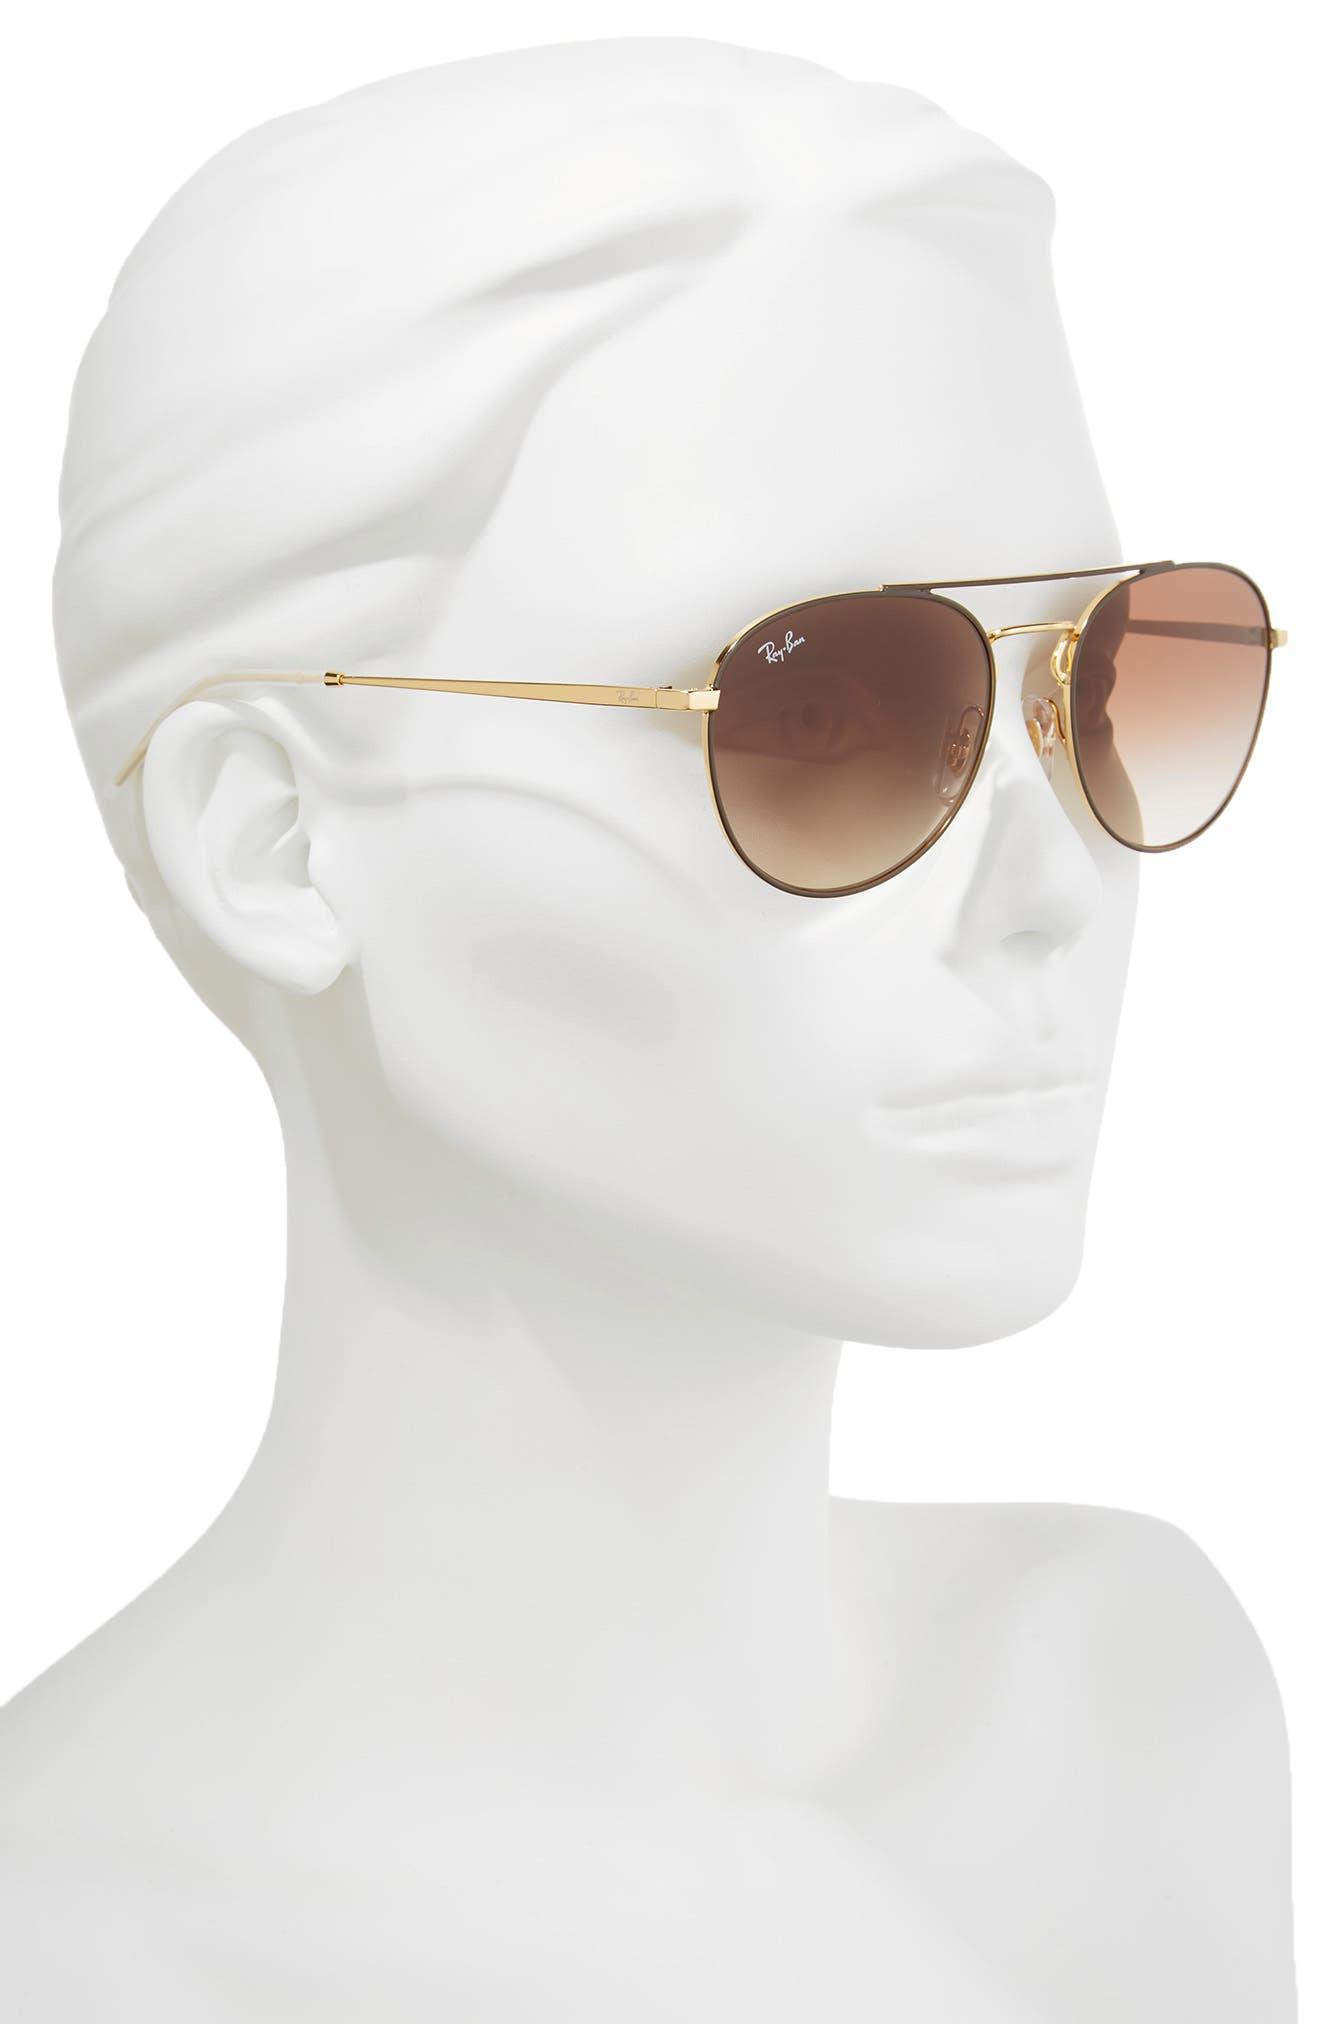 55mm Gradient Lens Round Aviator Sunglasses,                             Alternate thumbnail 2, color,                             Gold Brown